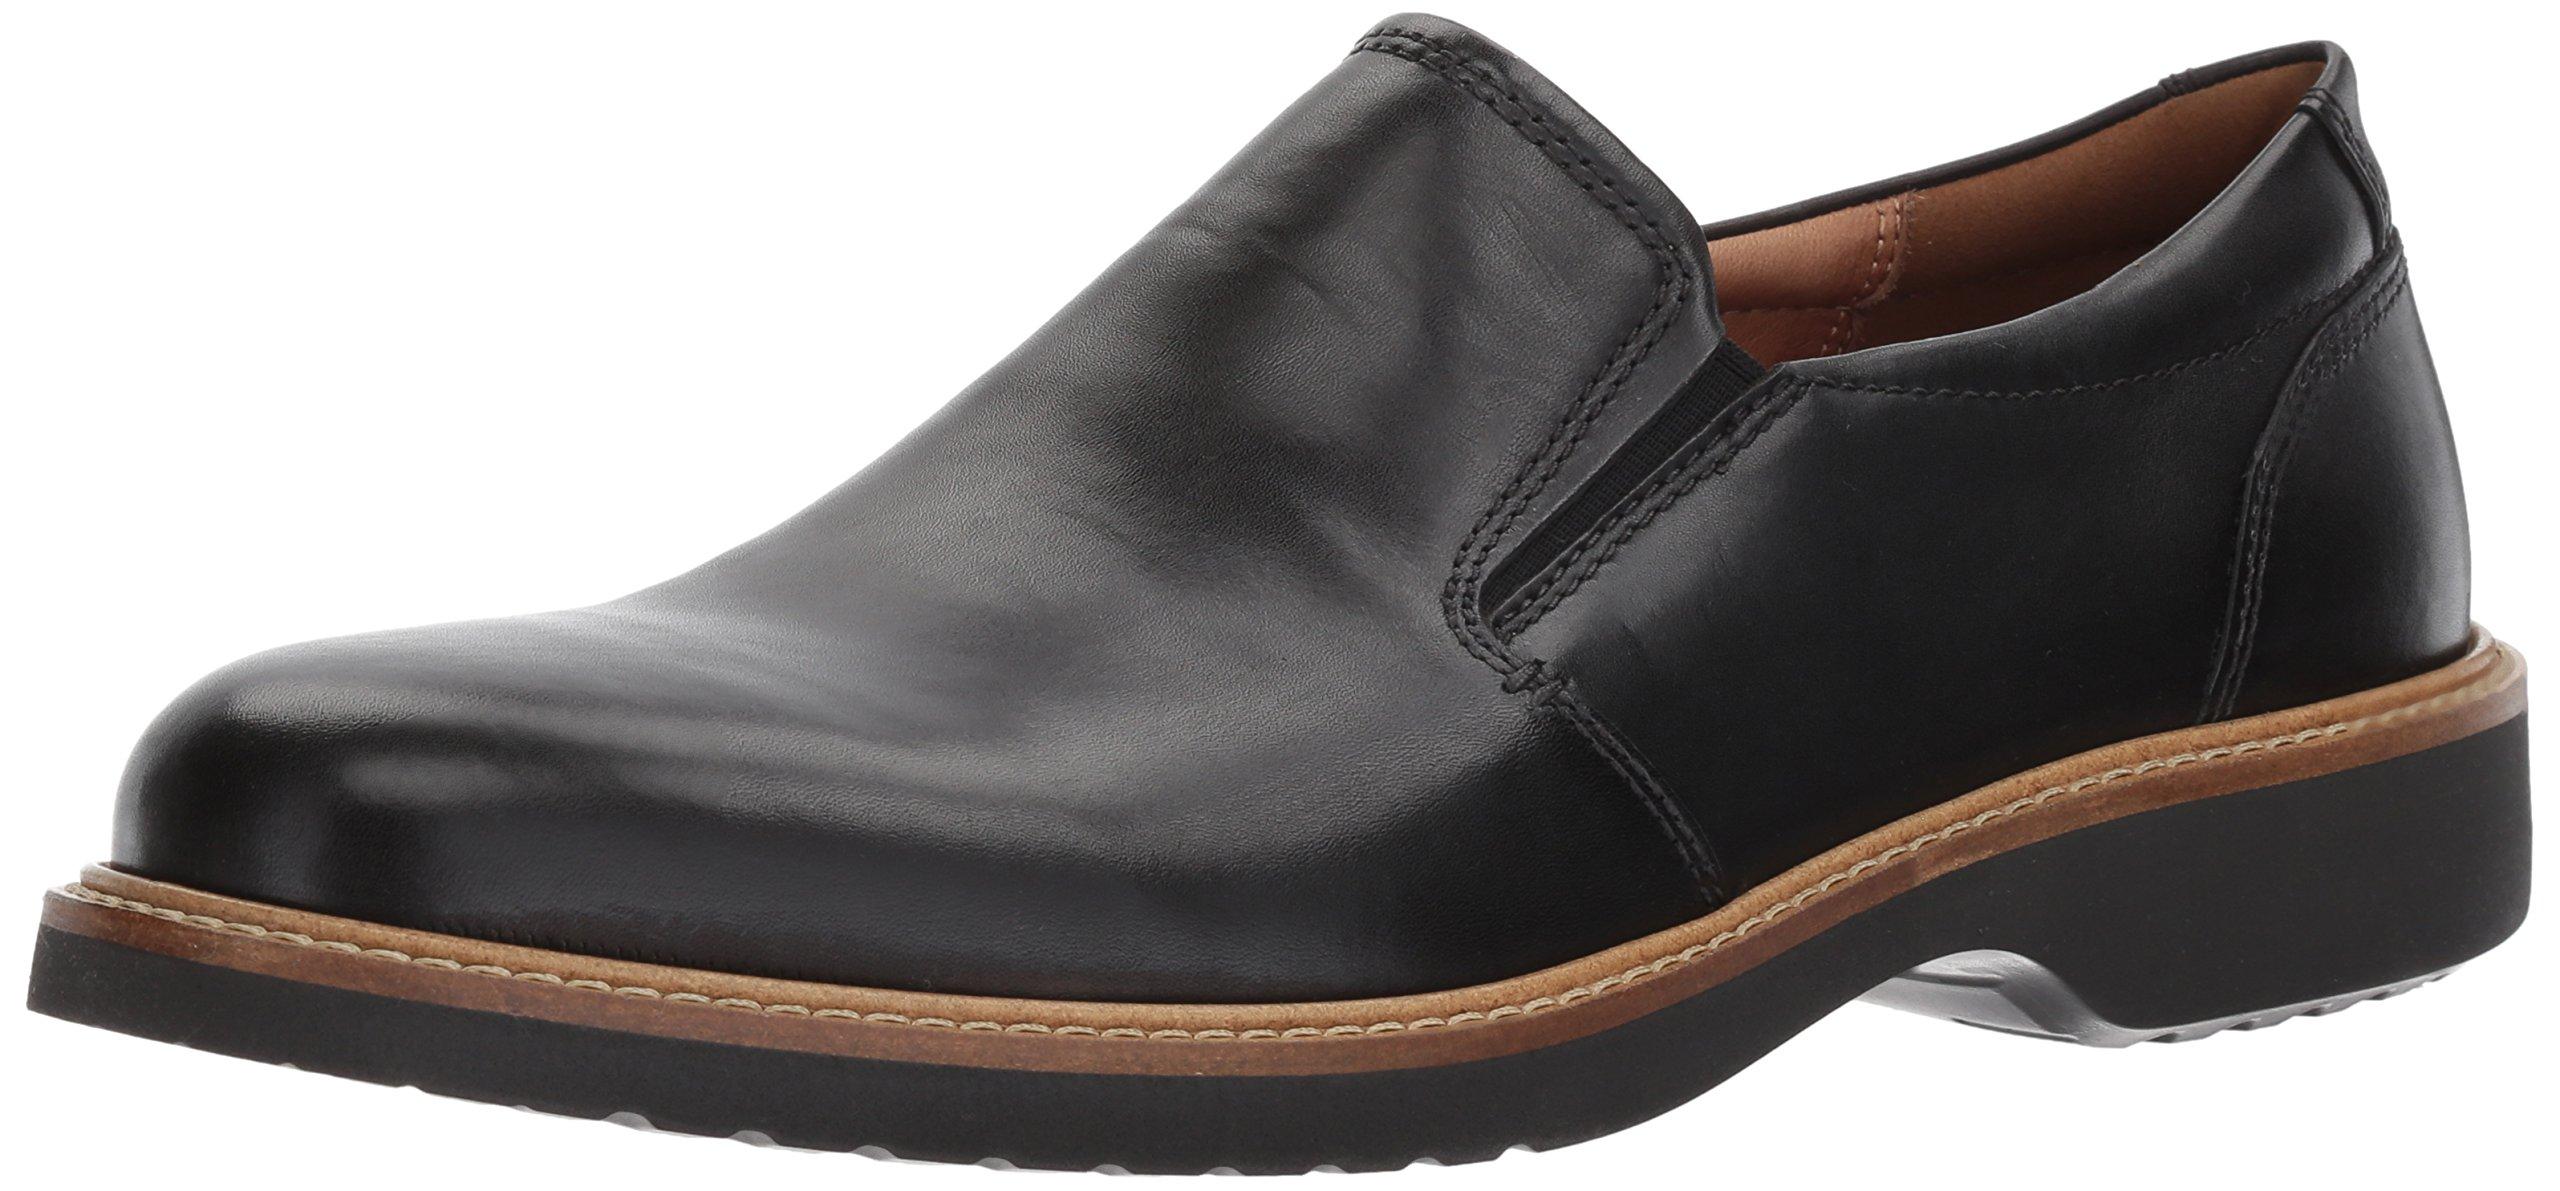 ECCO Men's Ian Casual Slip-On Loafer, Black, 42 EU/8-8.5 M US